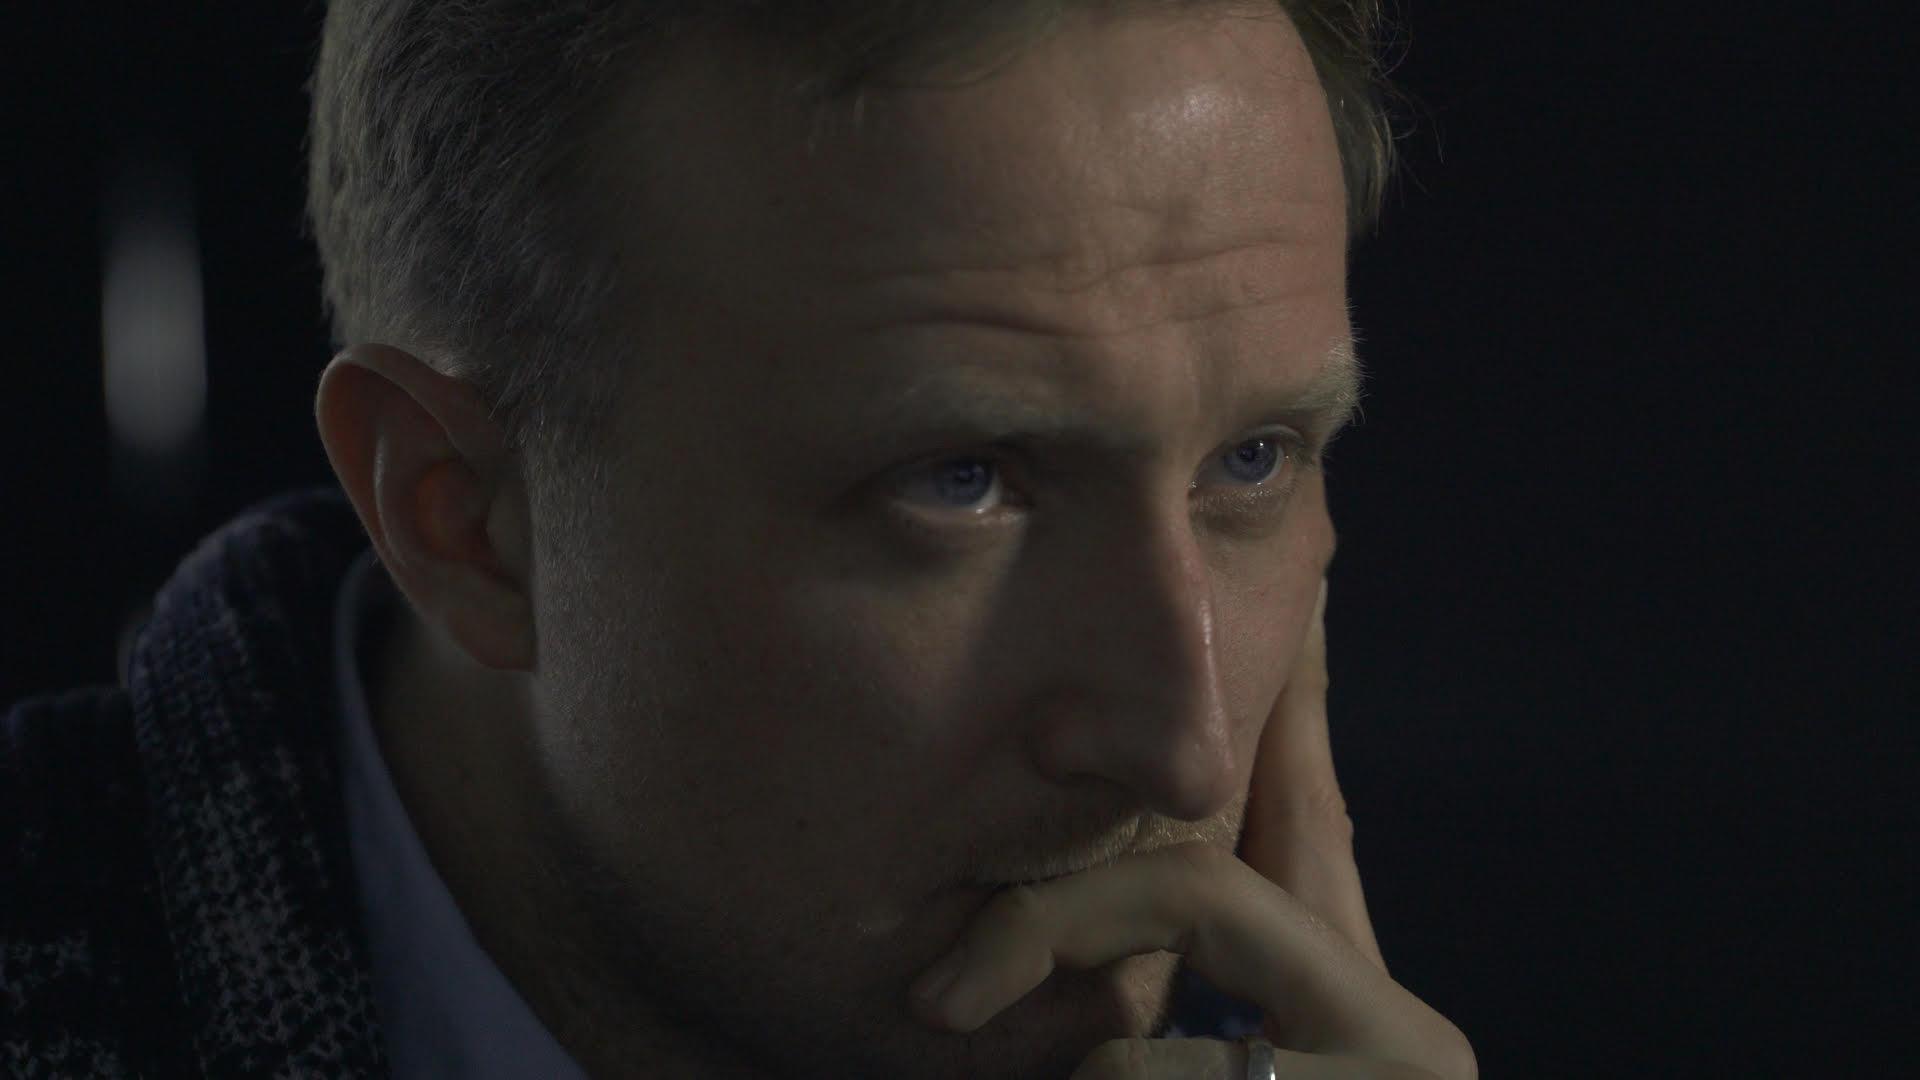 Filmmaker Jason Loftus